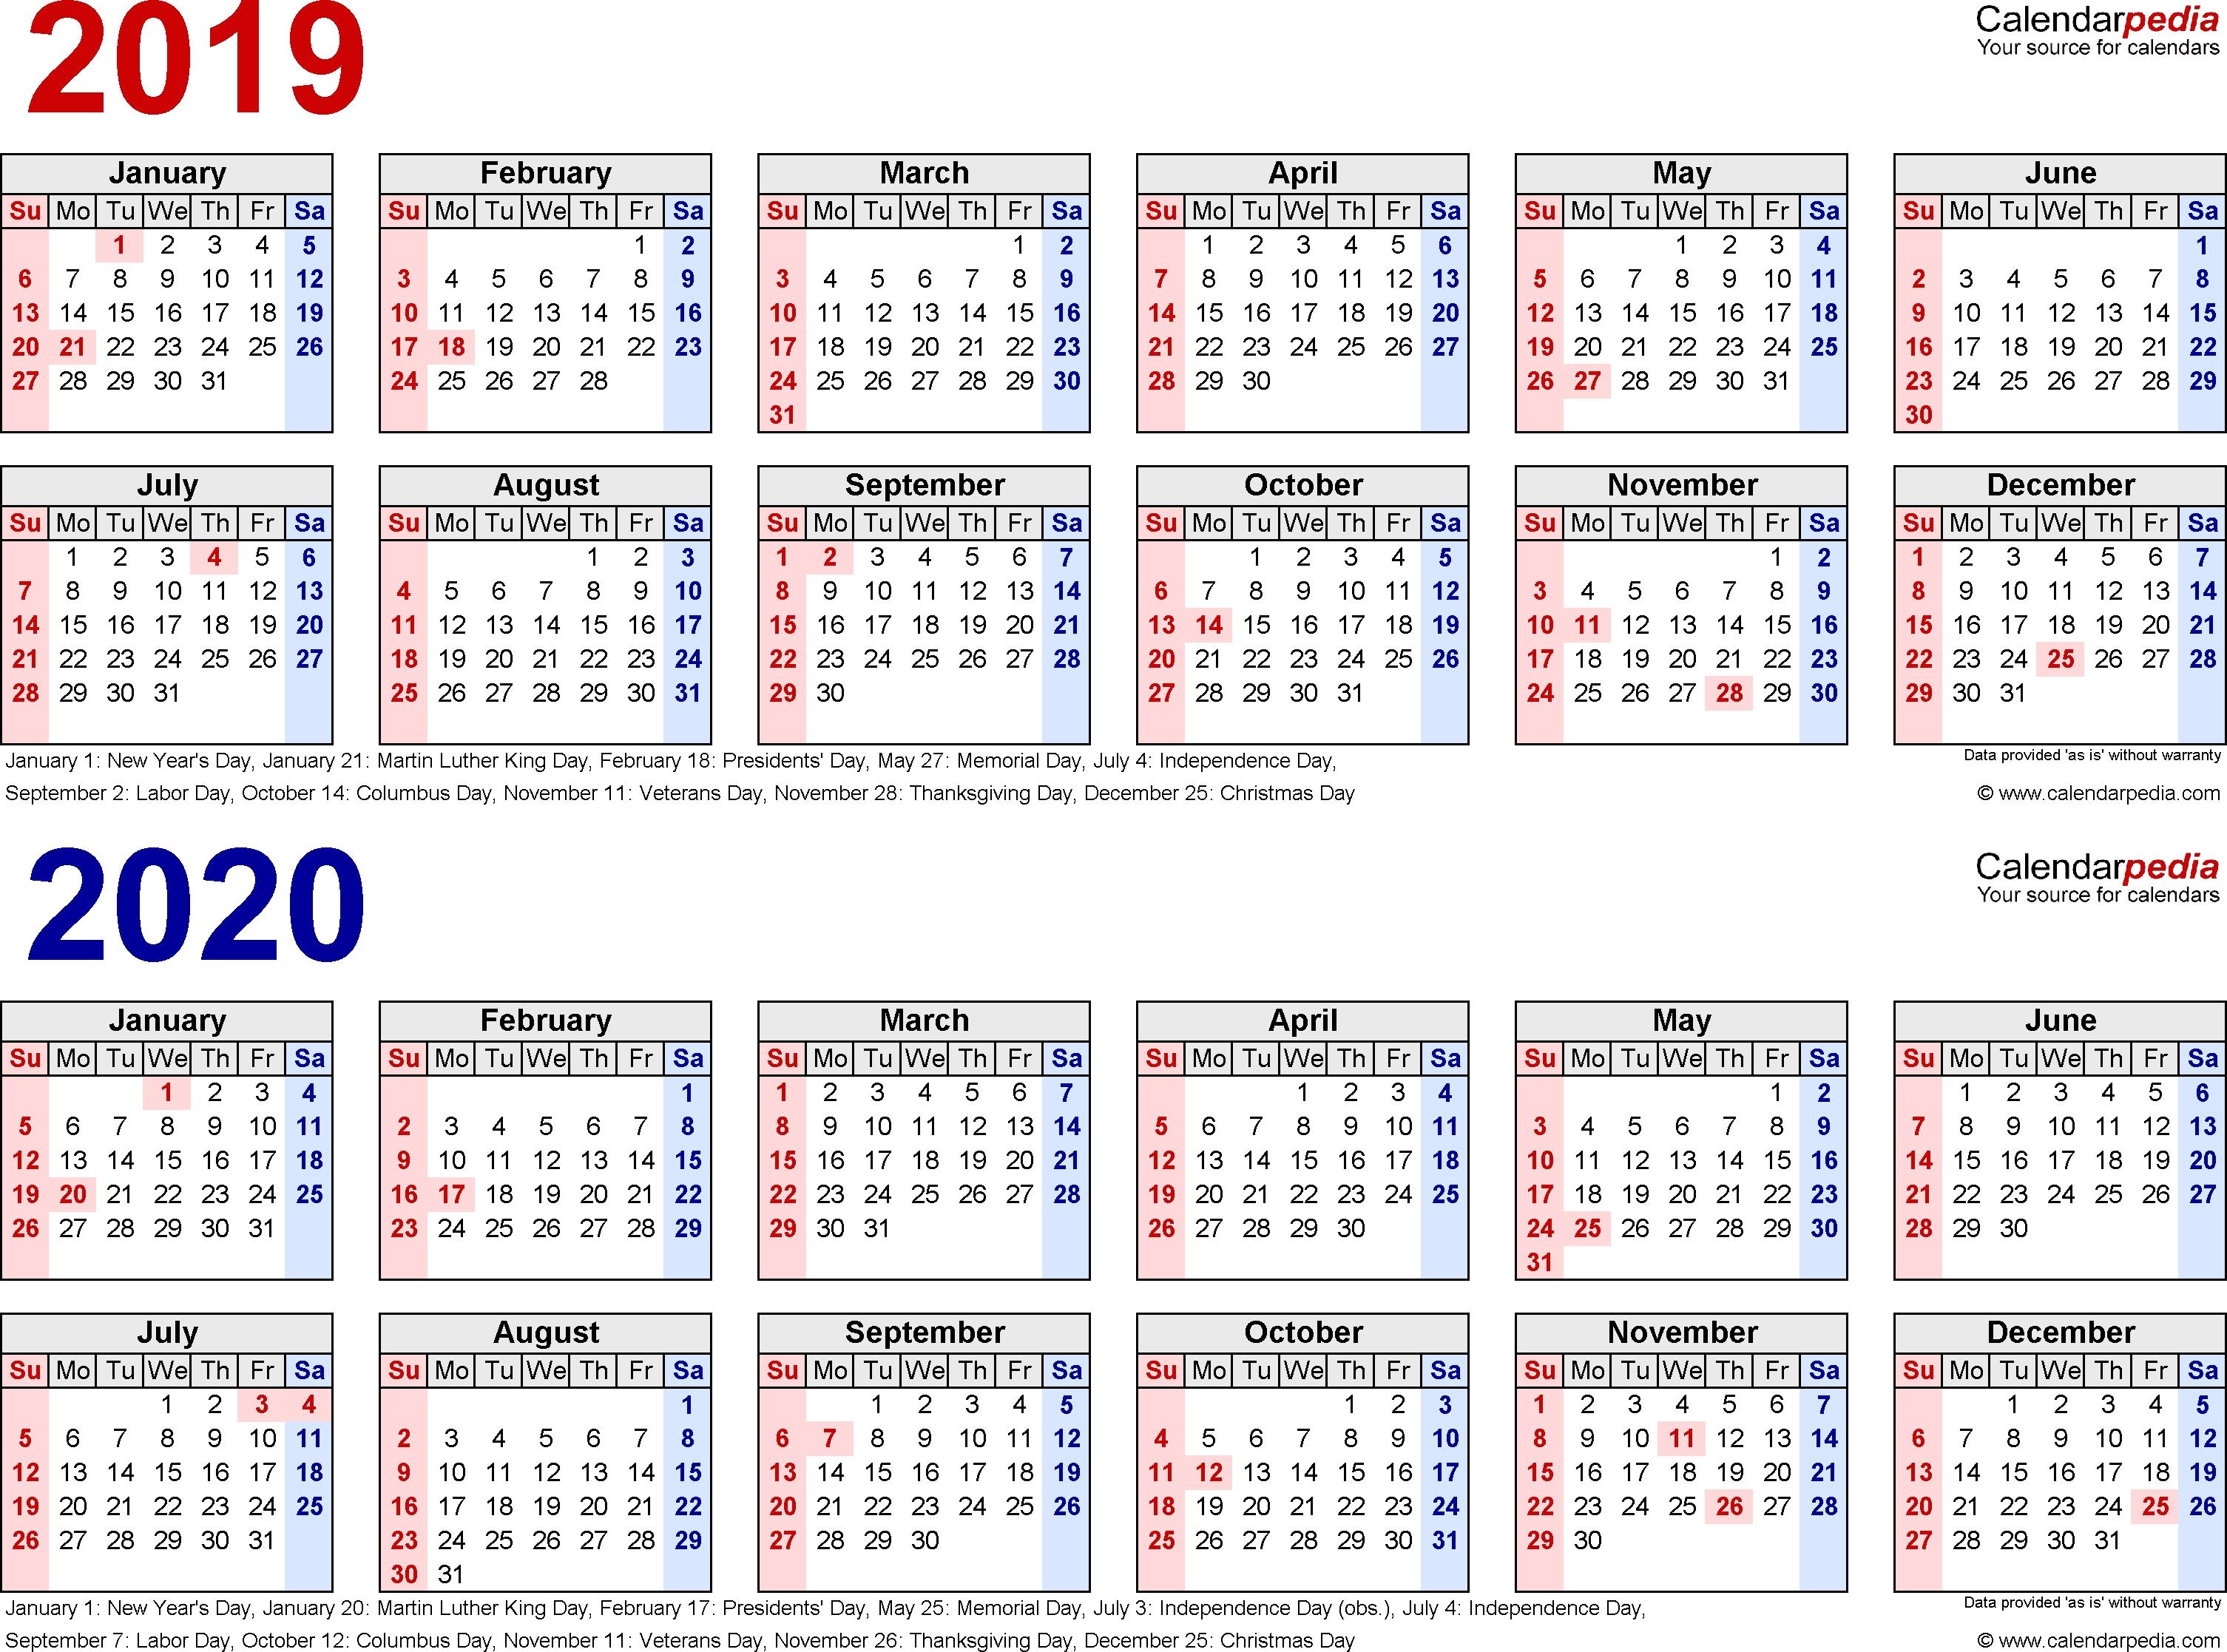 2019-2020 Calendar - Free Printable Two-Year Excel Calendars throughout Large Calendar 2019/2020